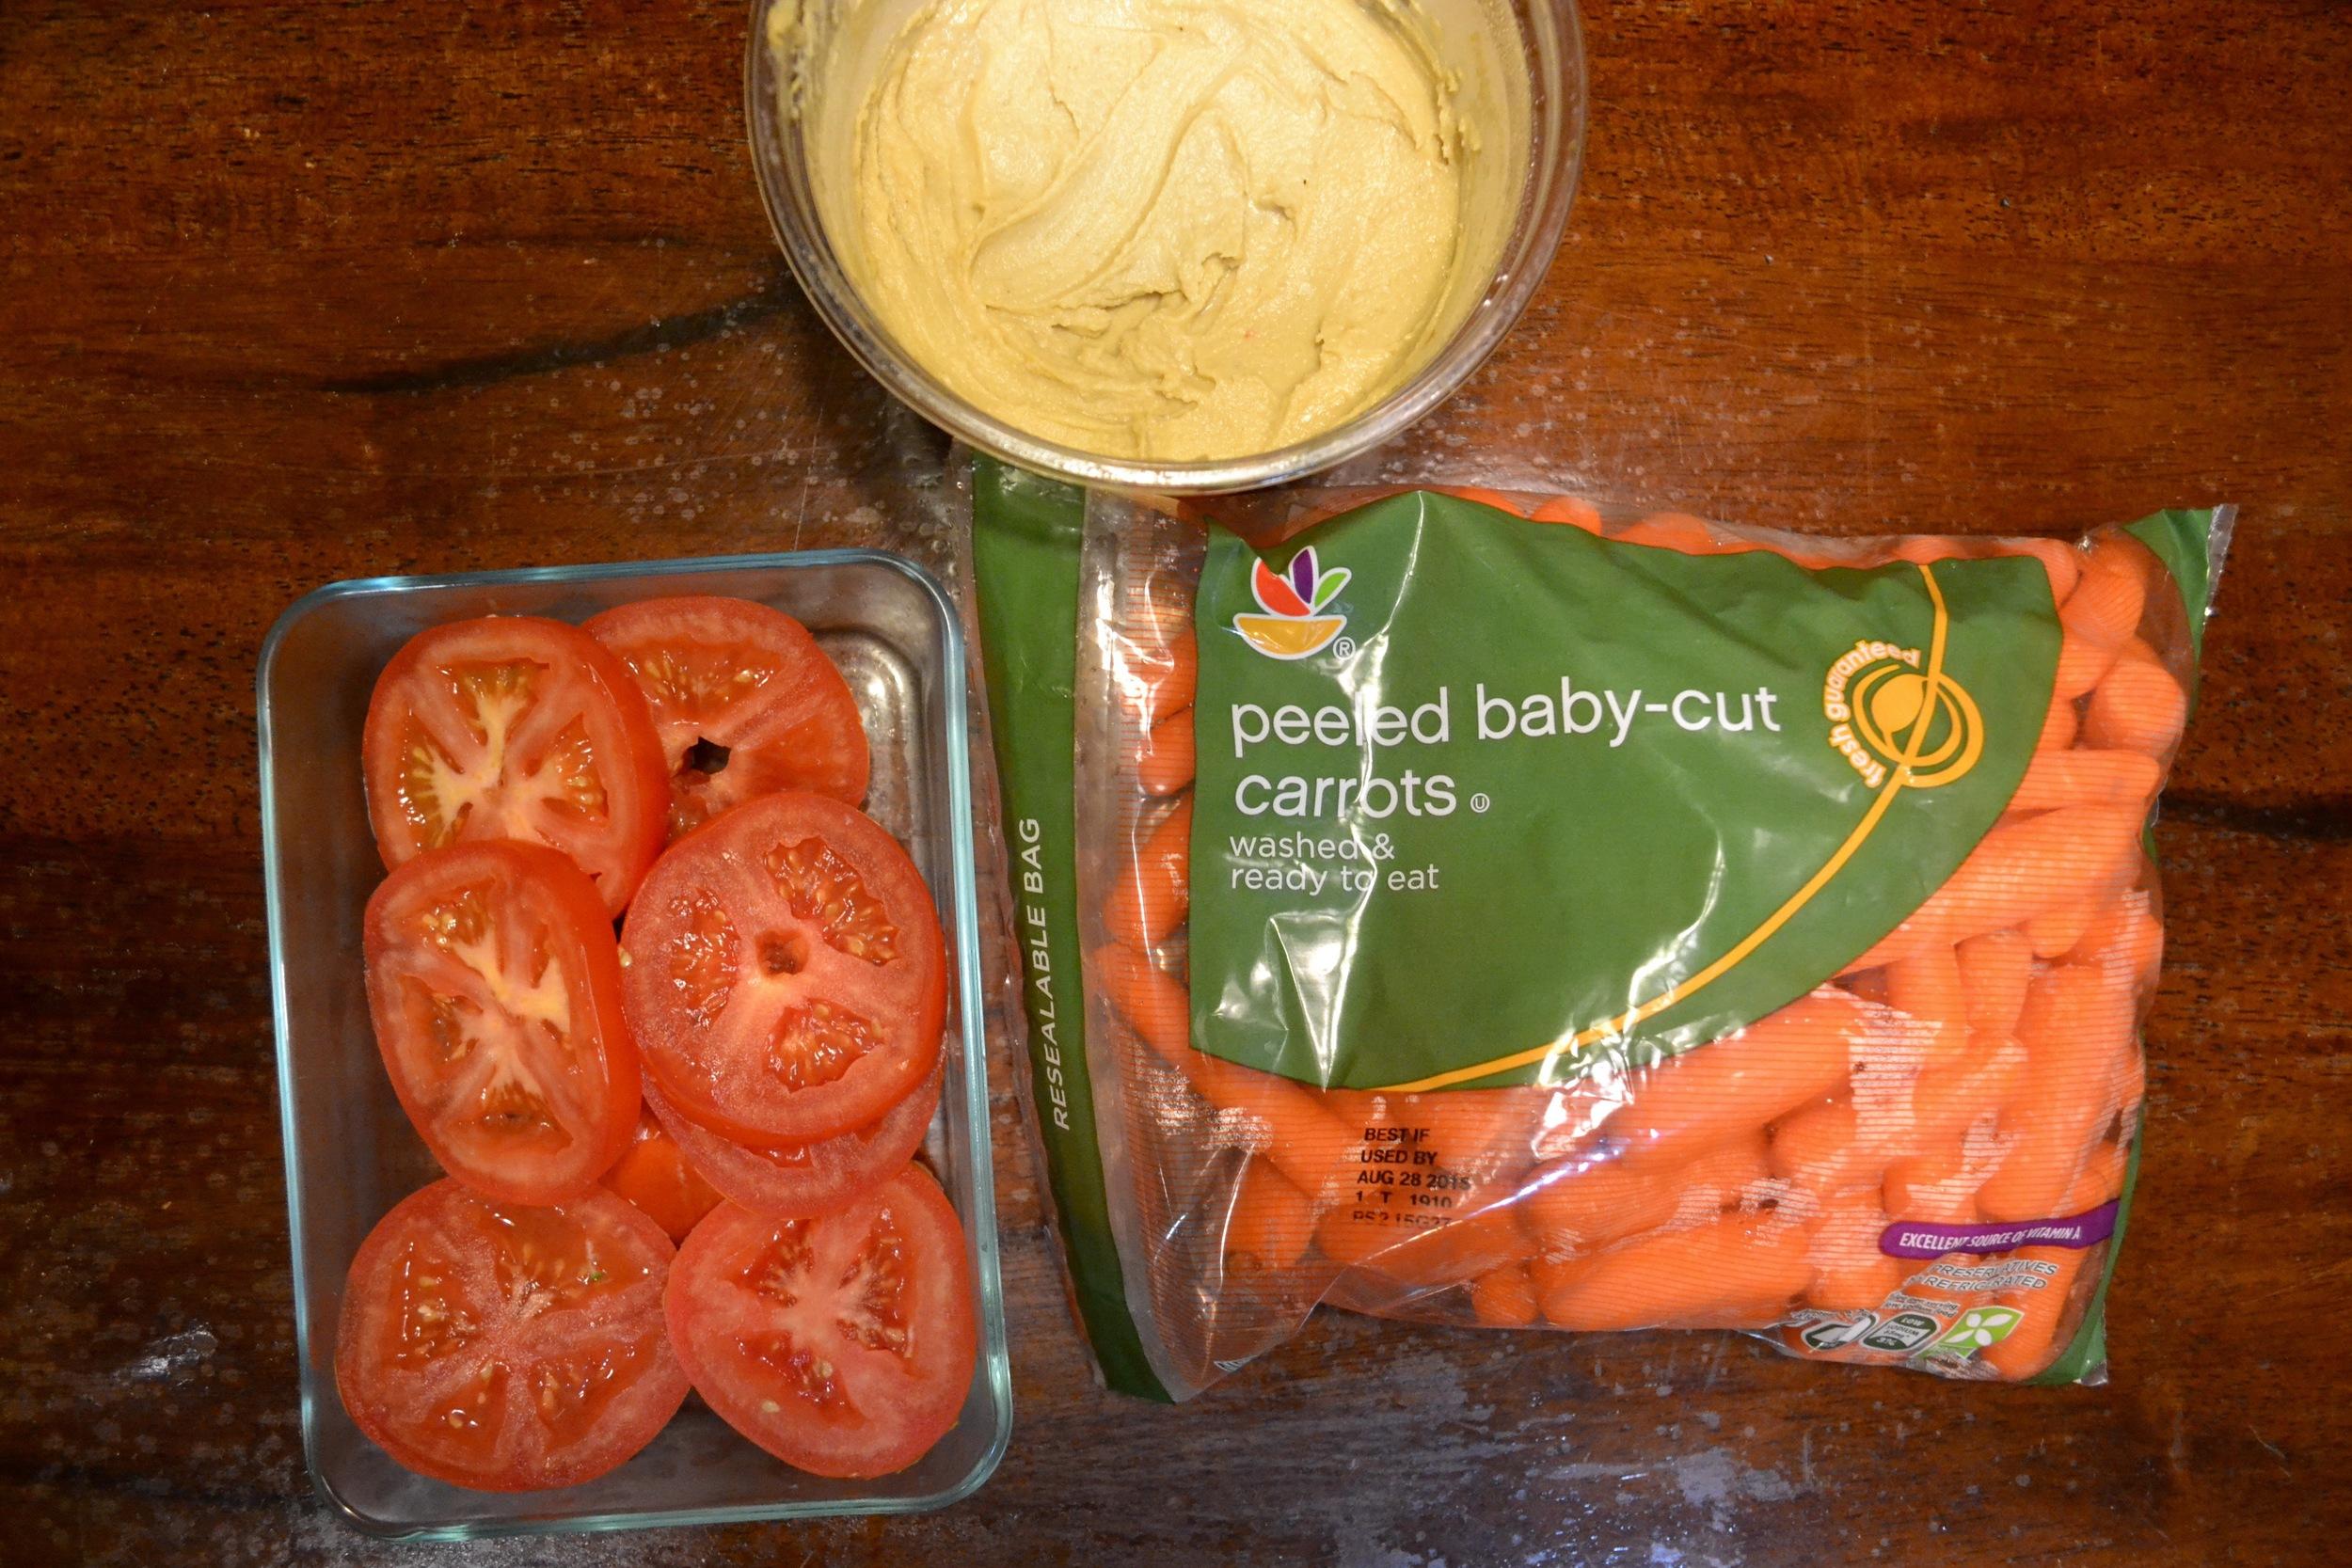 tomatoes, carrots, and hummus